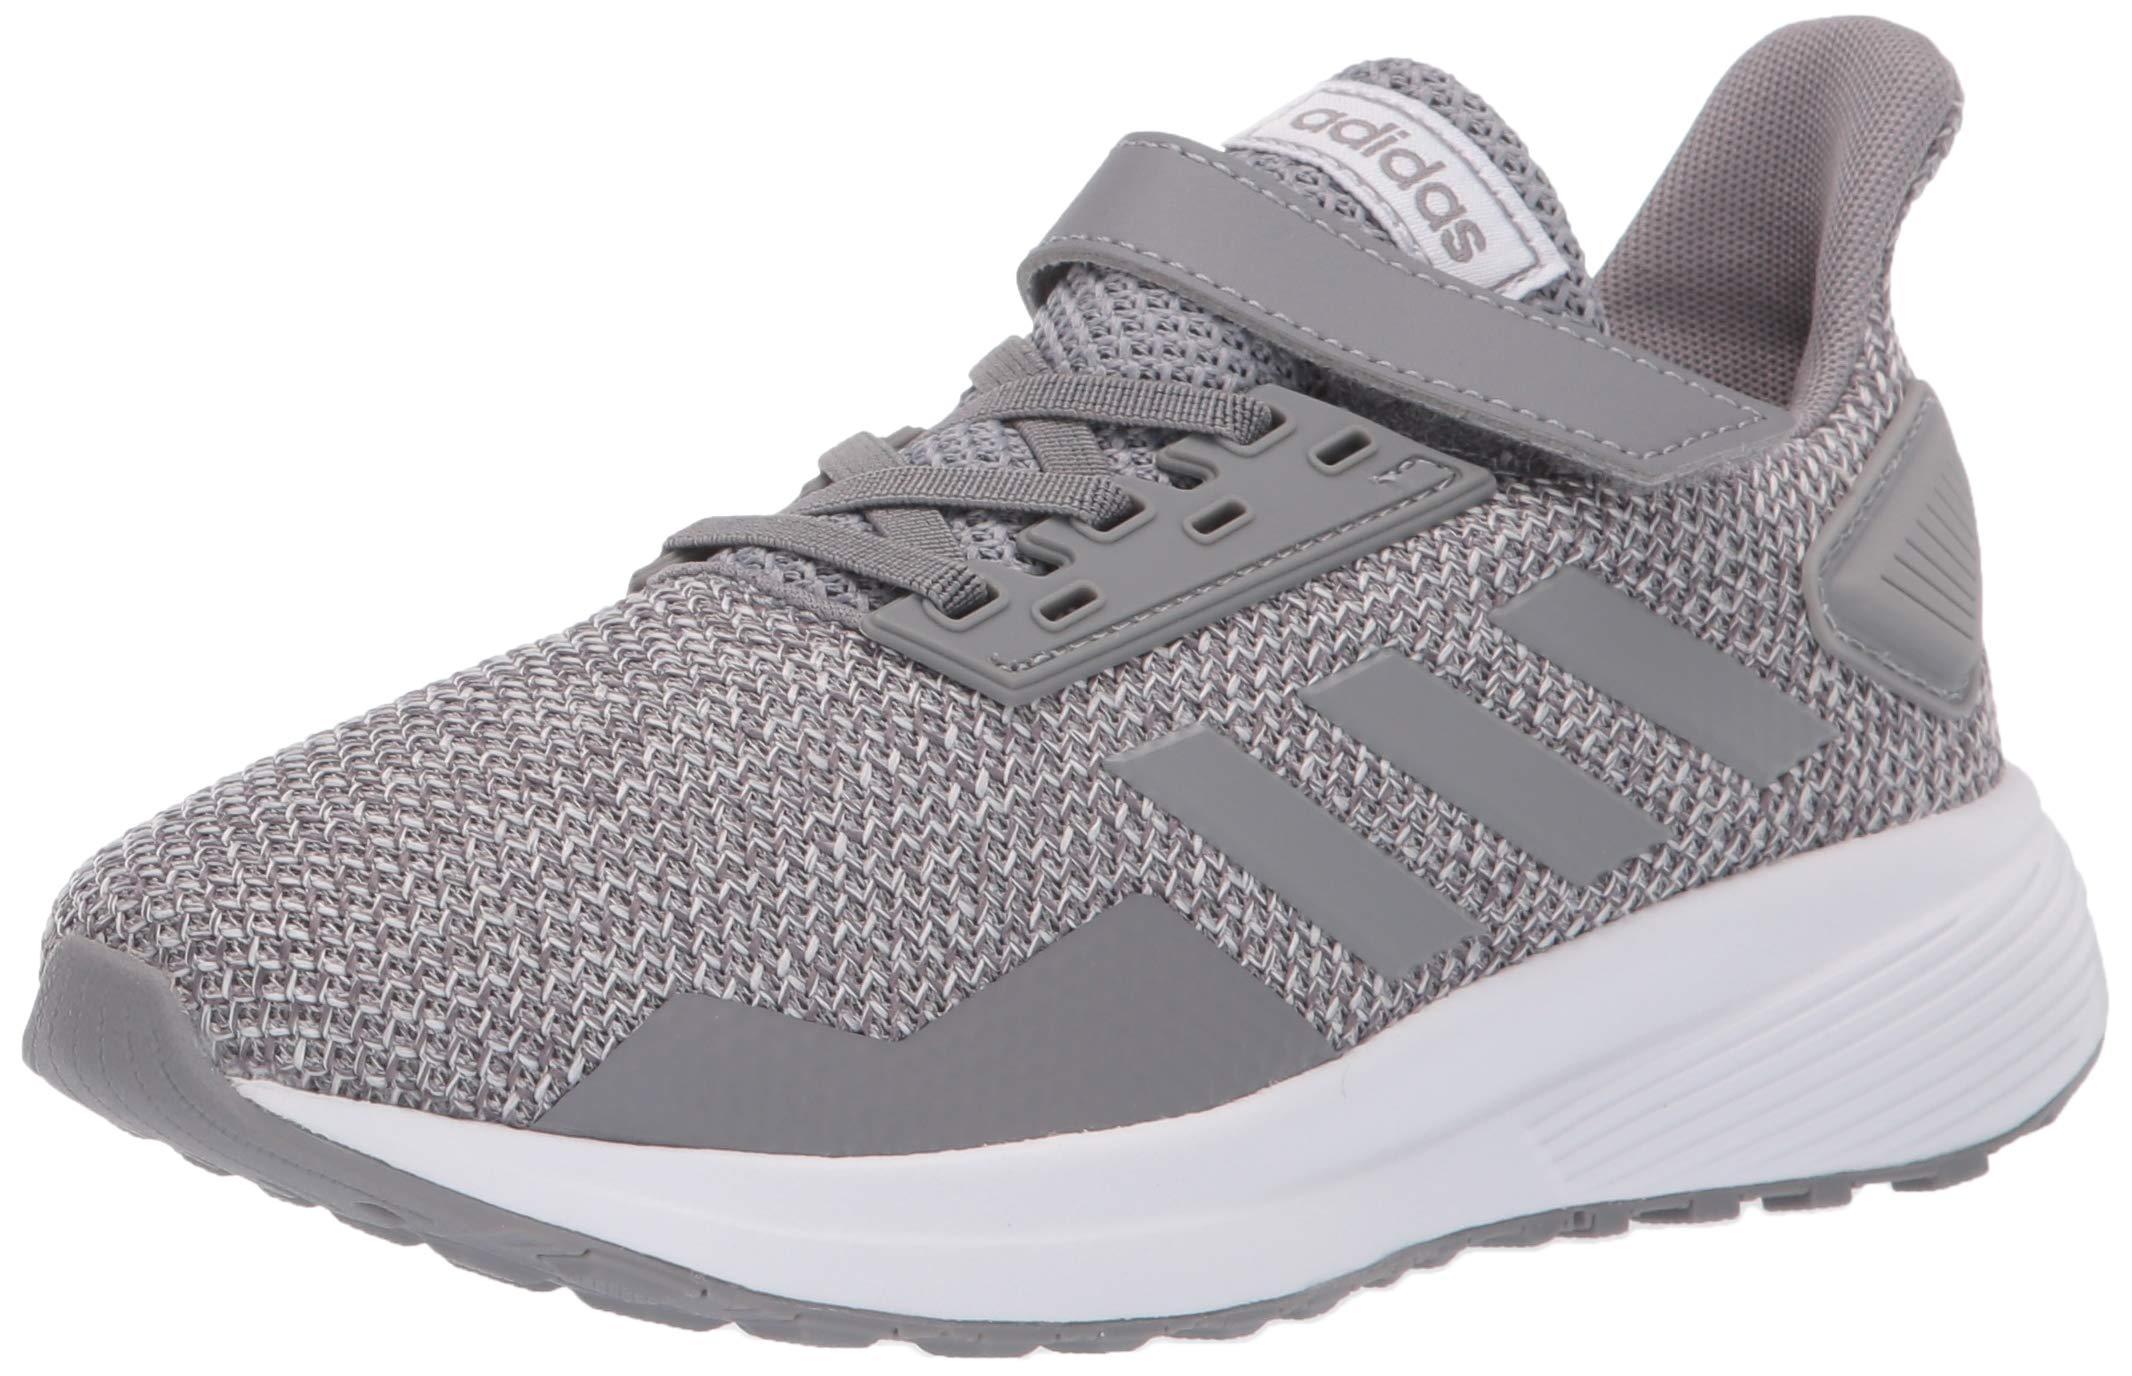 adidas unisex-child Duramo 9 Wide, grey/grey/grey, 3 M US Little Kid